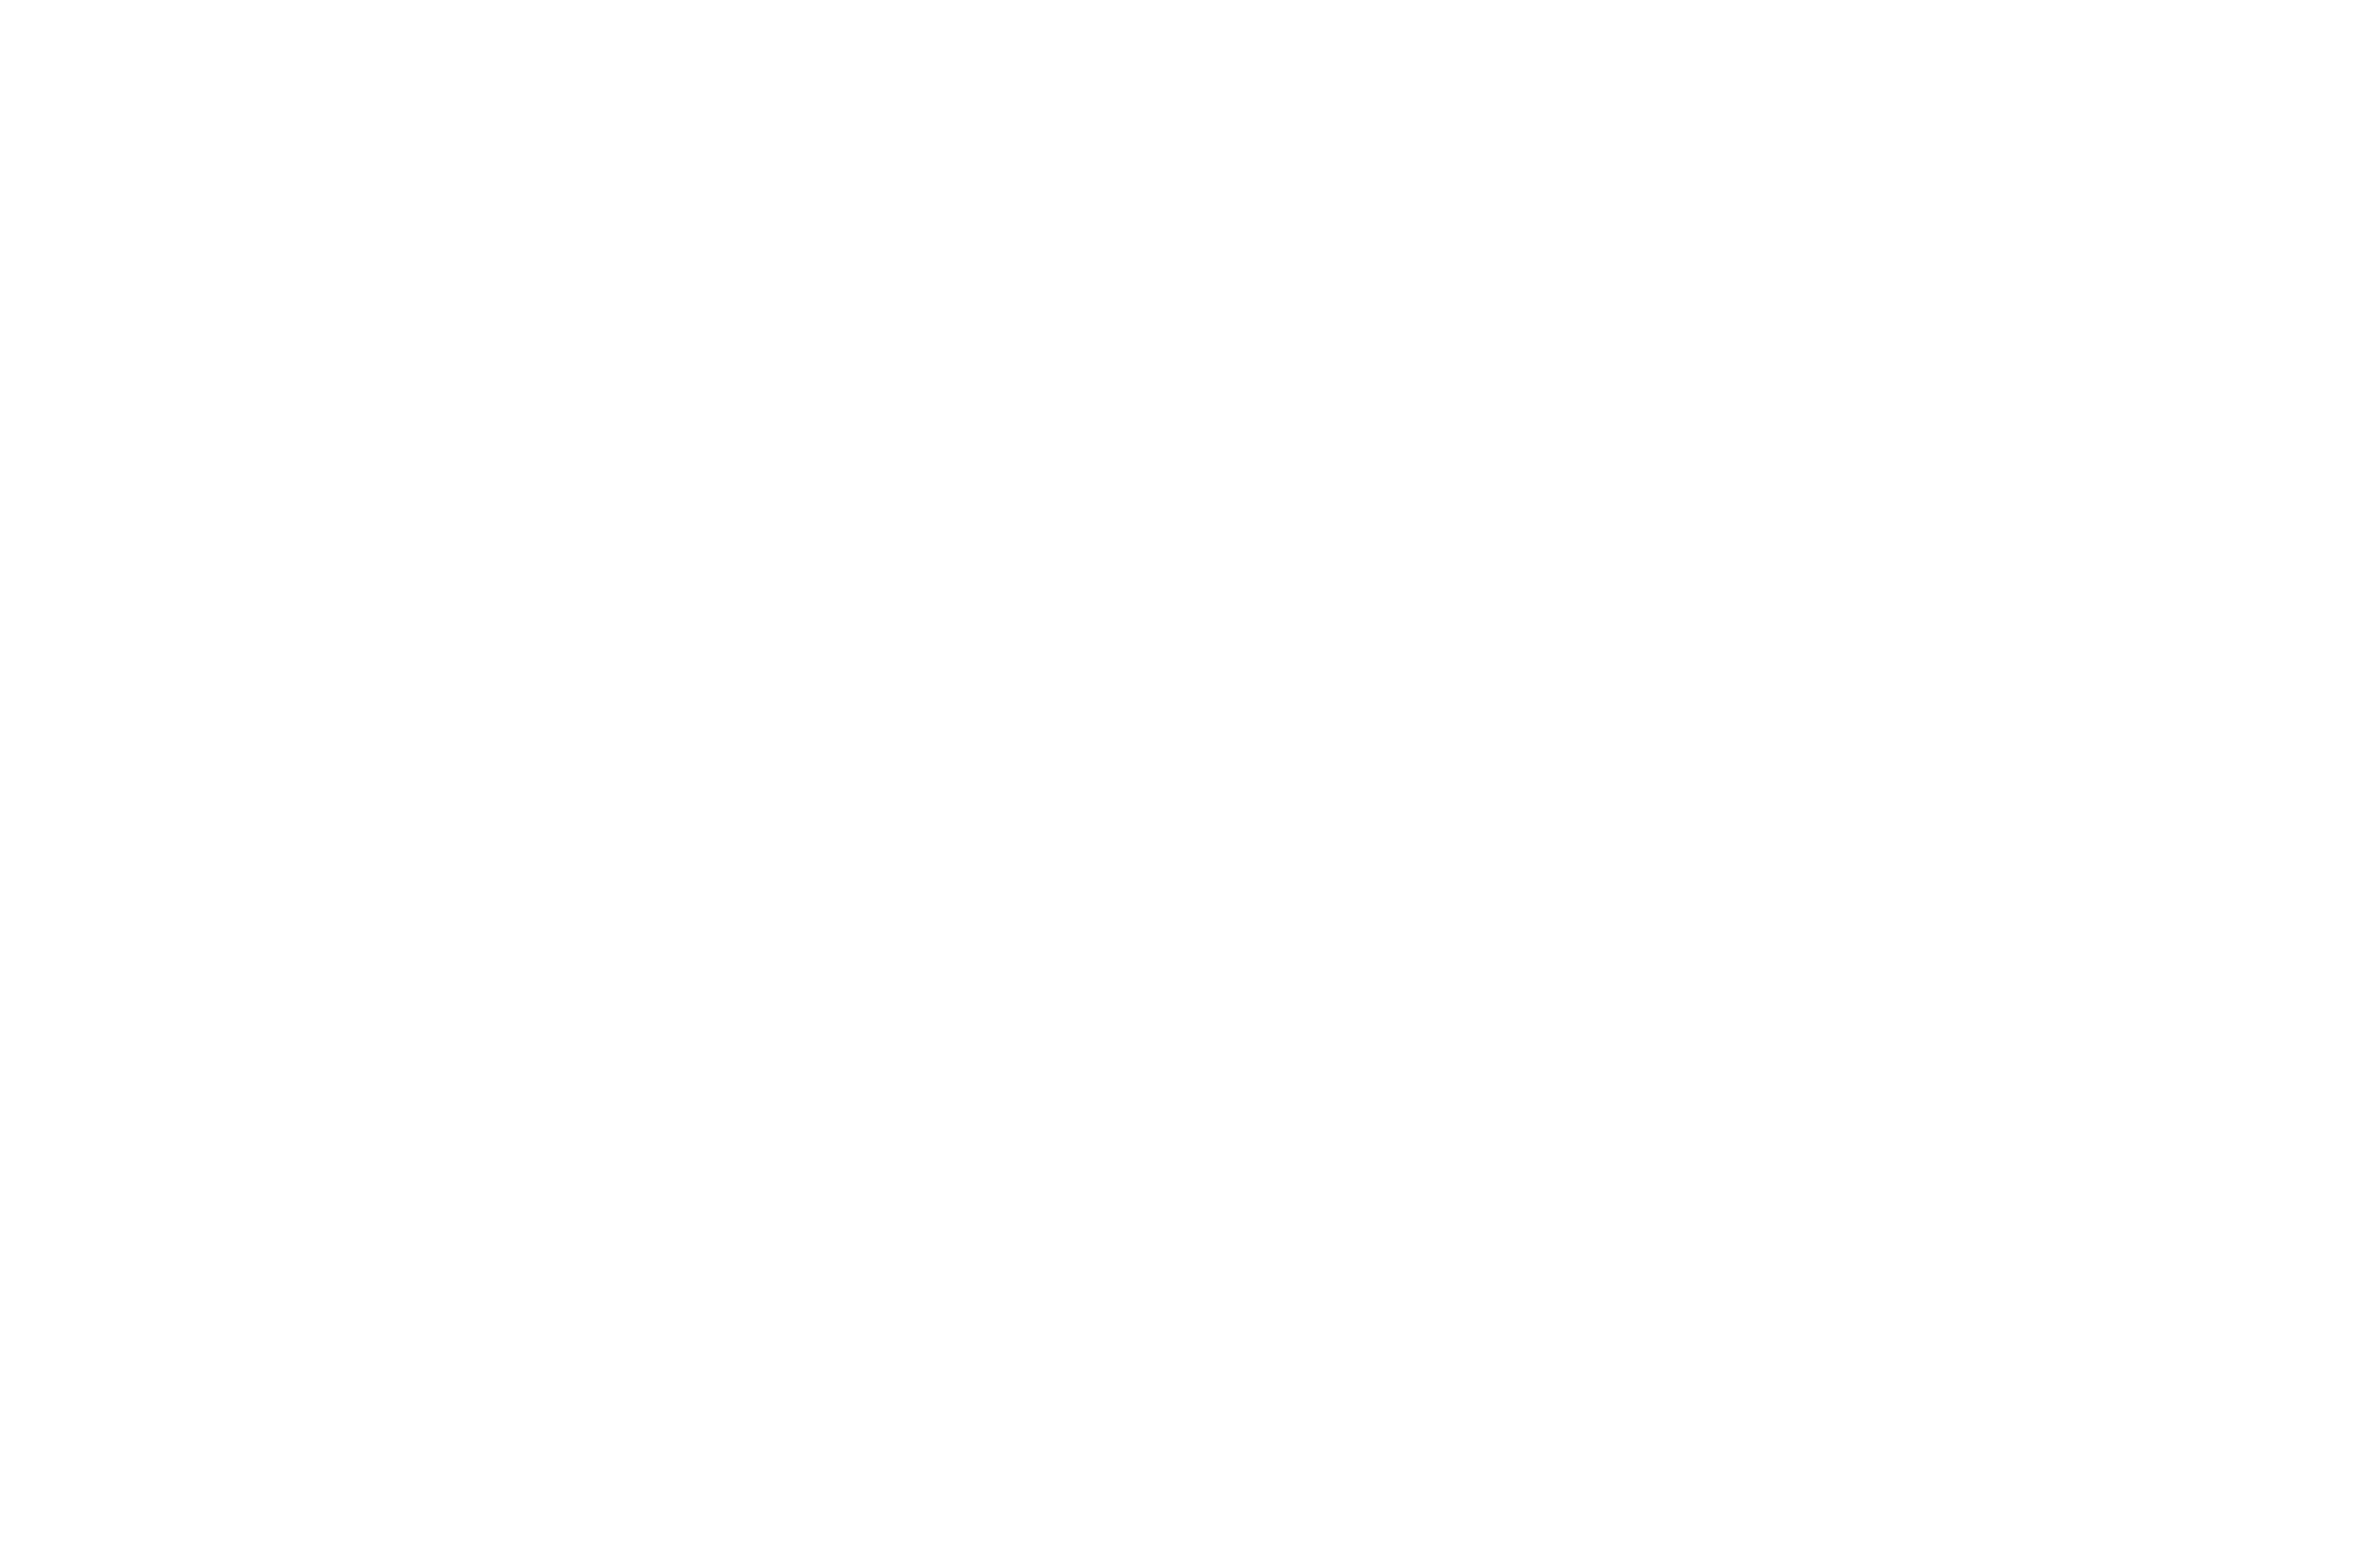 40 west logo